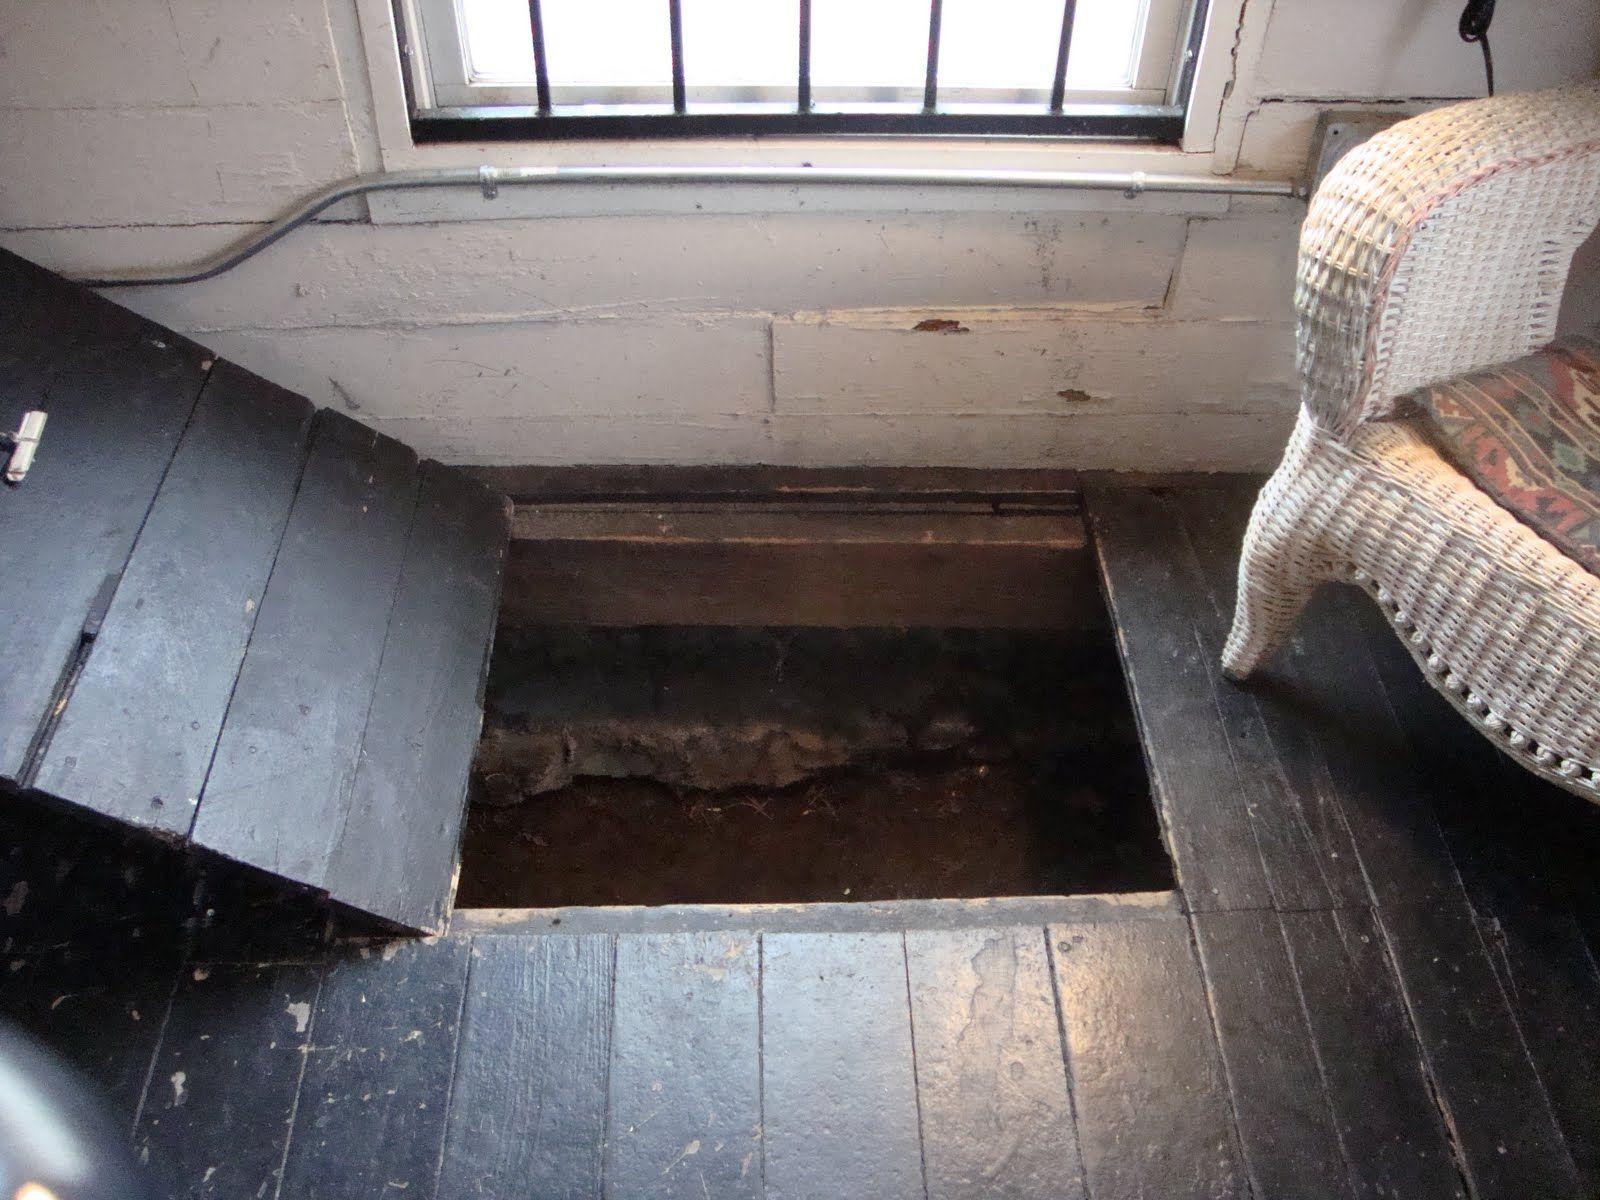 slavehaven at the burkle estate, an underground railroad safe